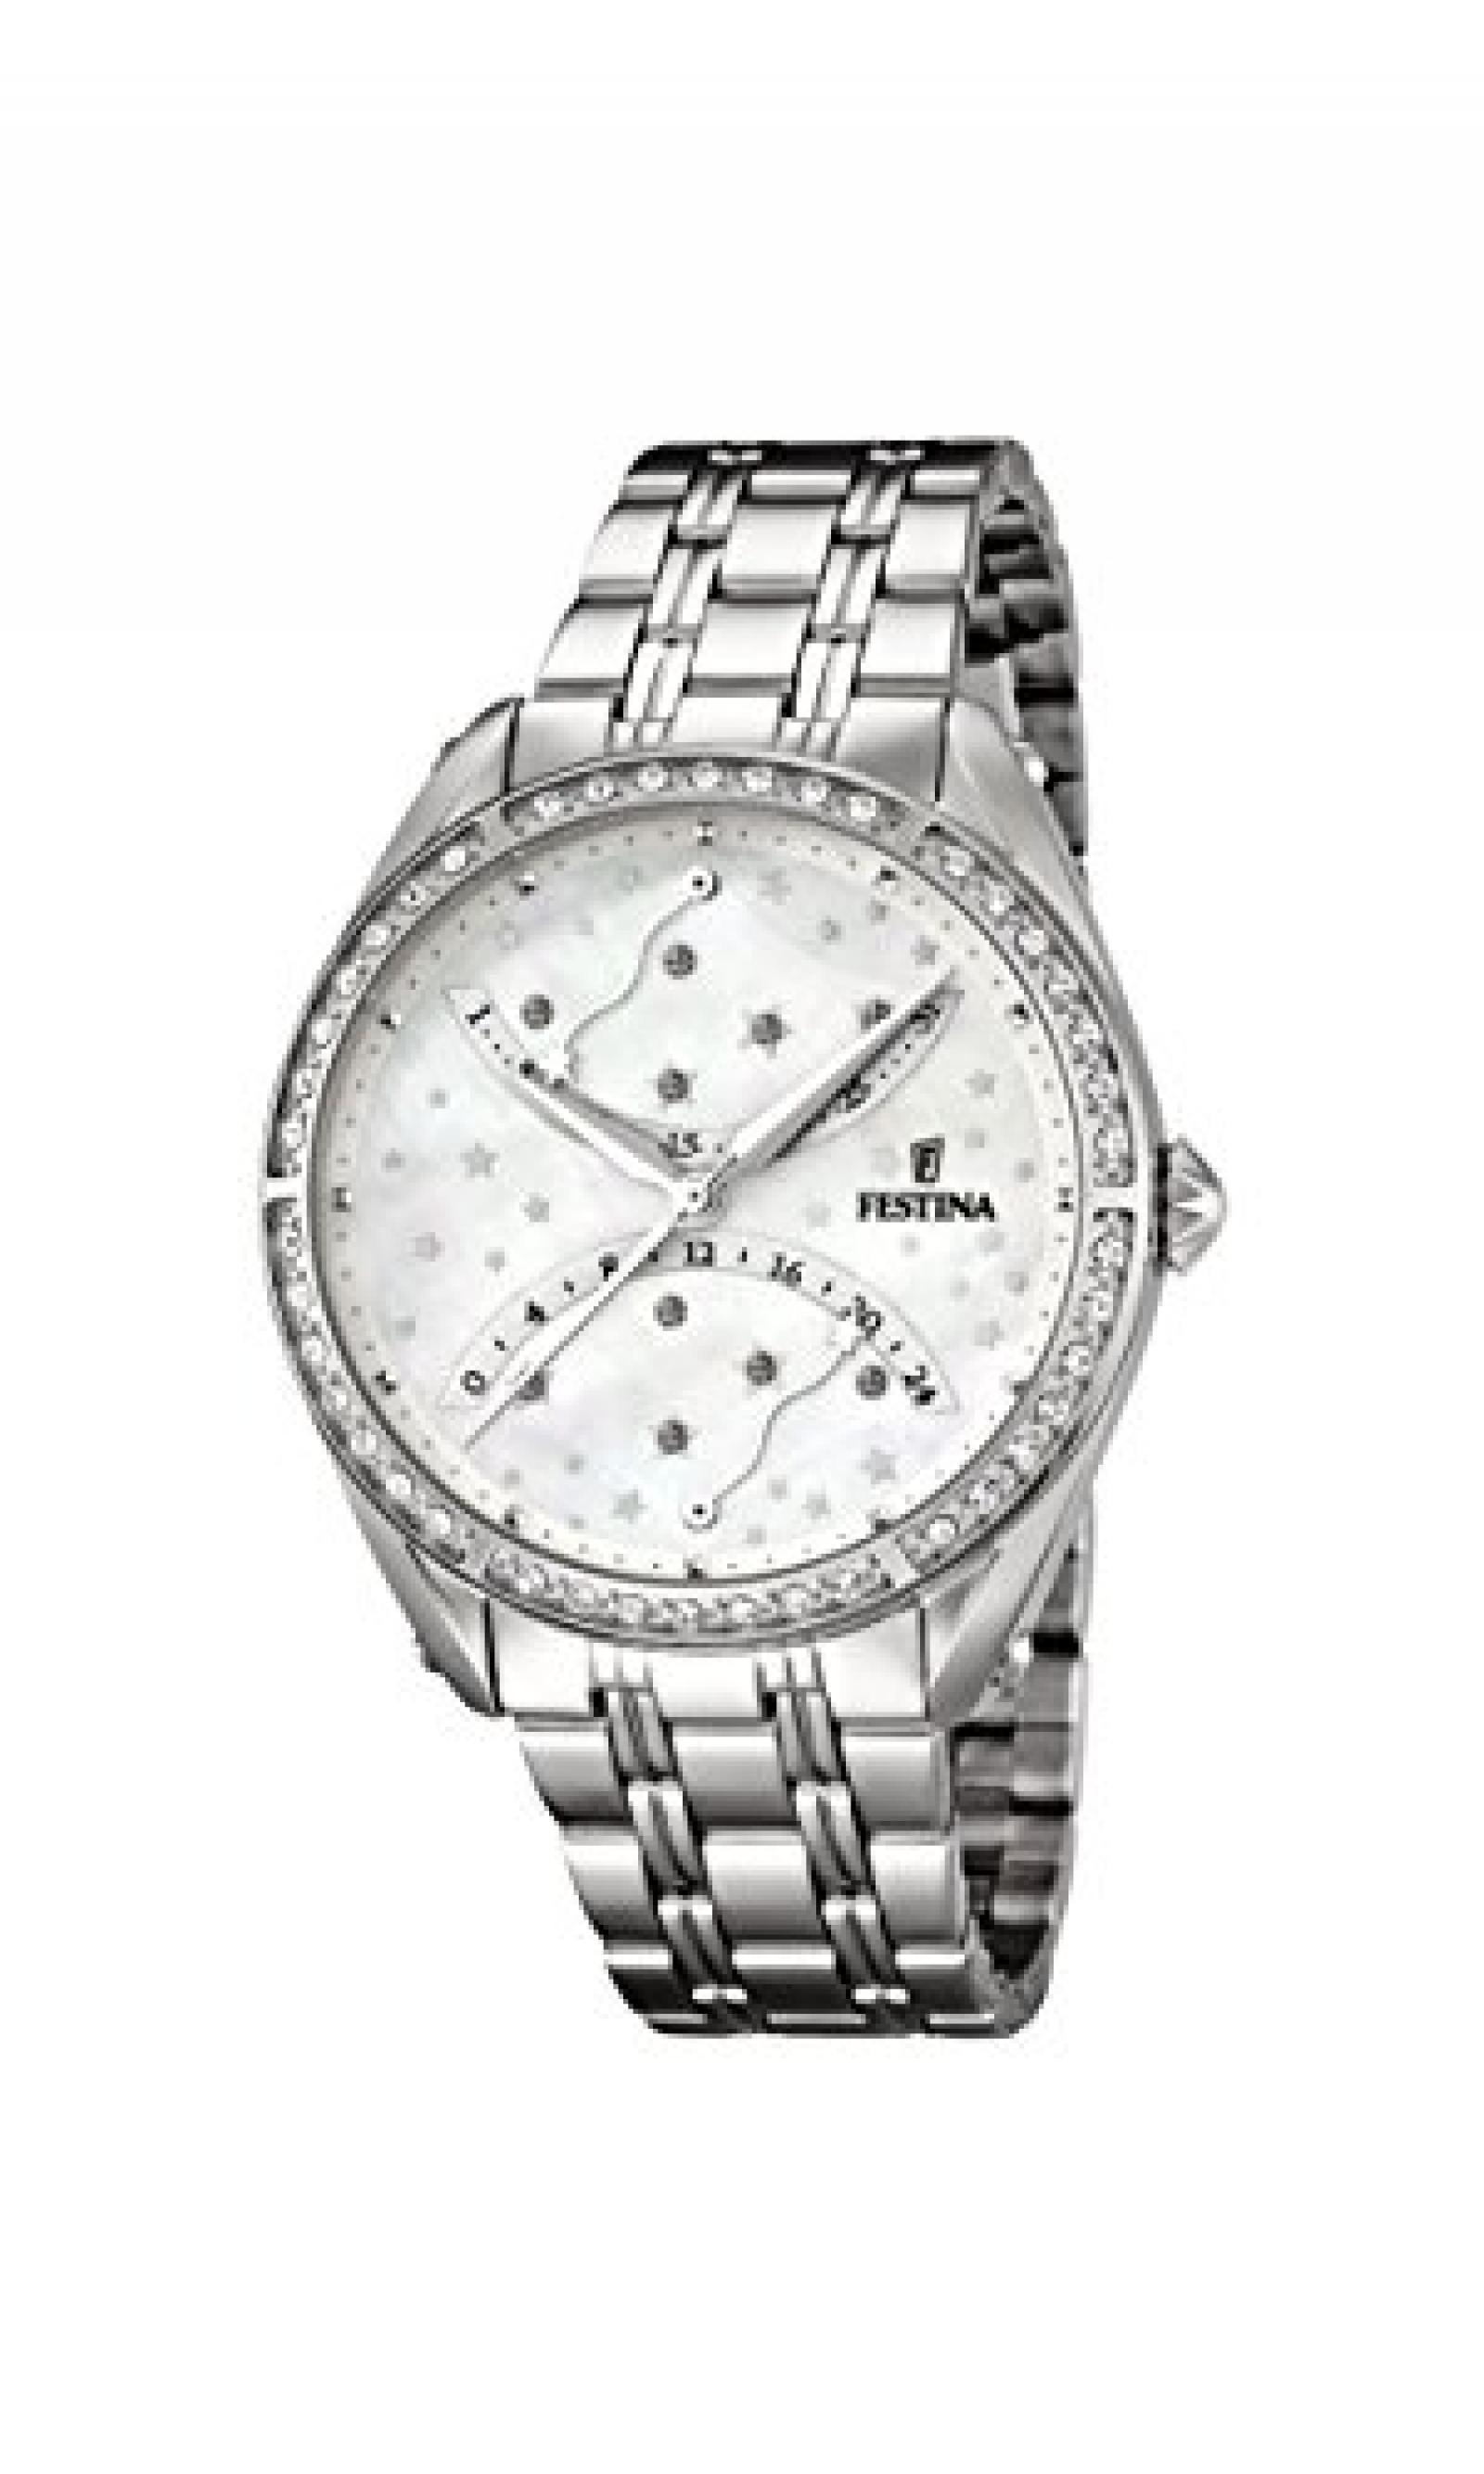 Festina Damen-Armbanduhr Analog Quarz Edelstahl F16741/1